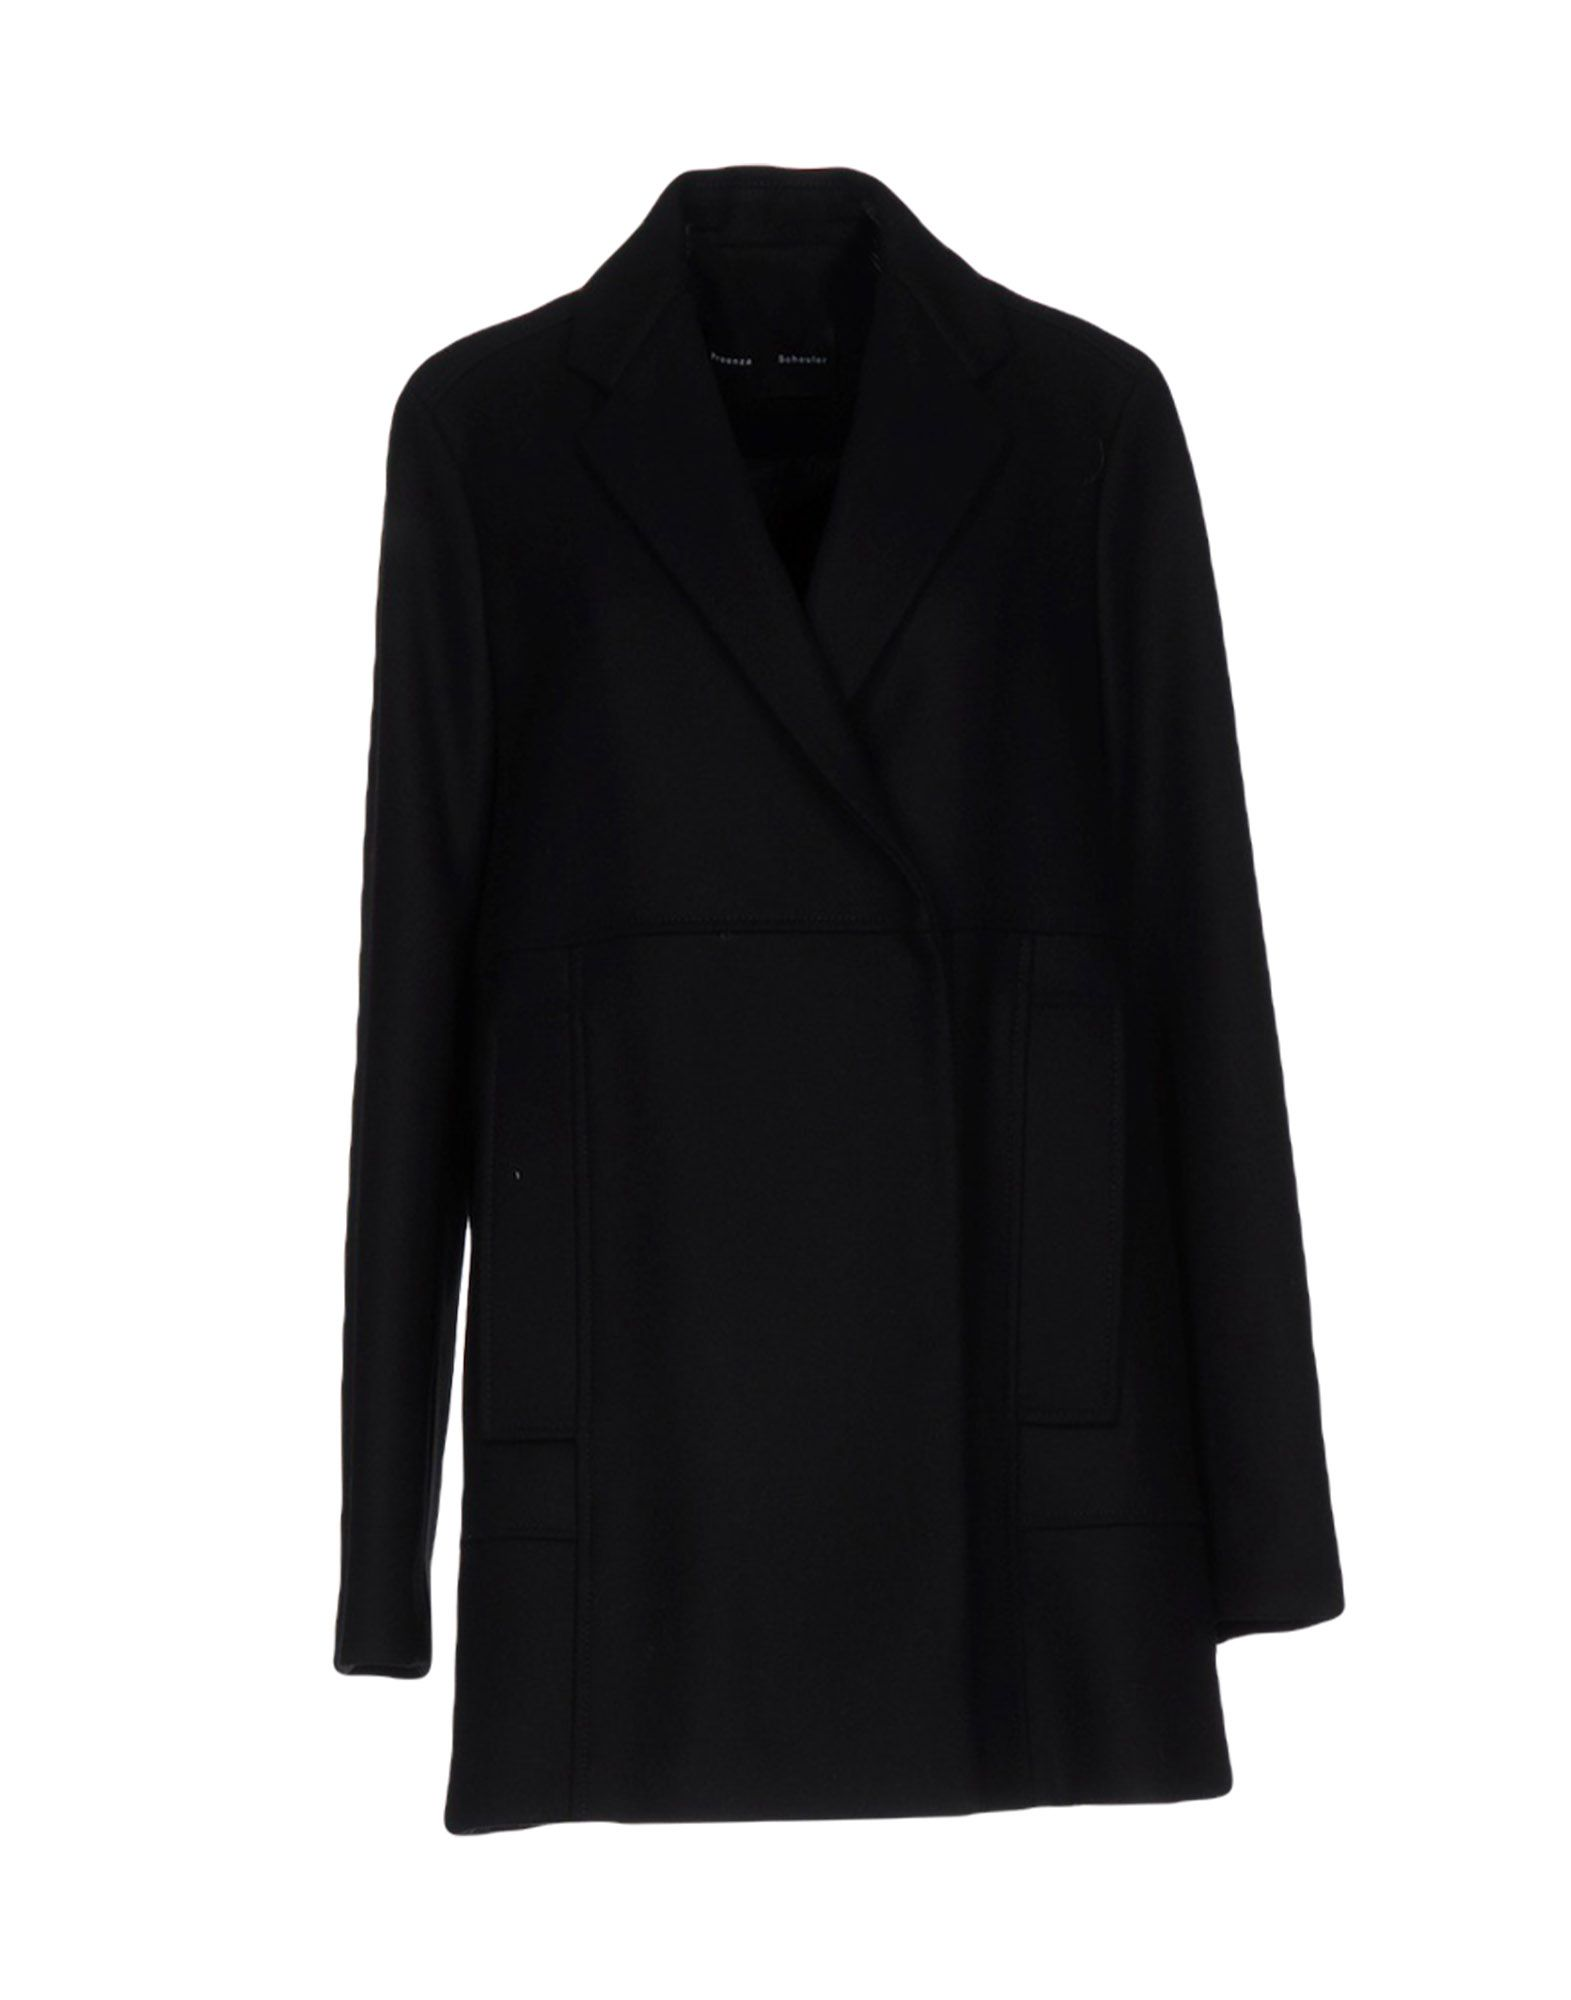 PROENZA SCHOULER Пальто пальто зима кожаные рукава цена